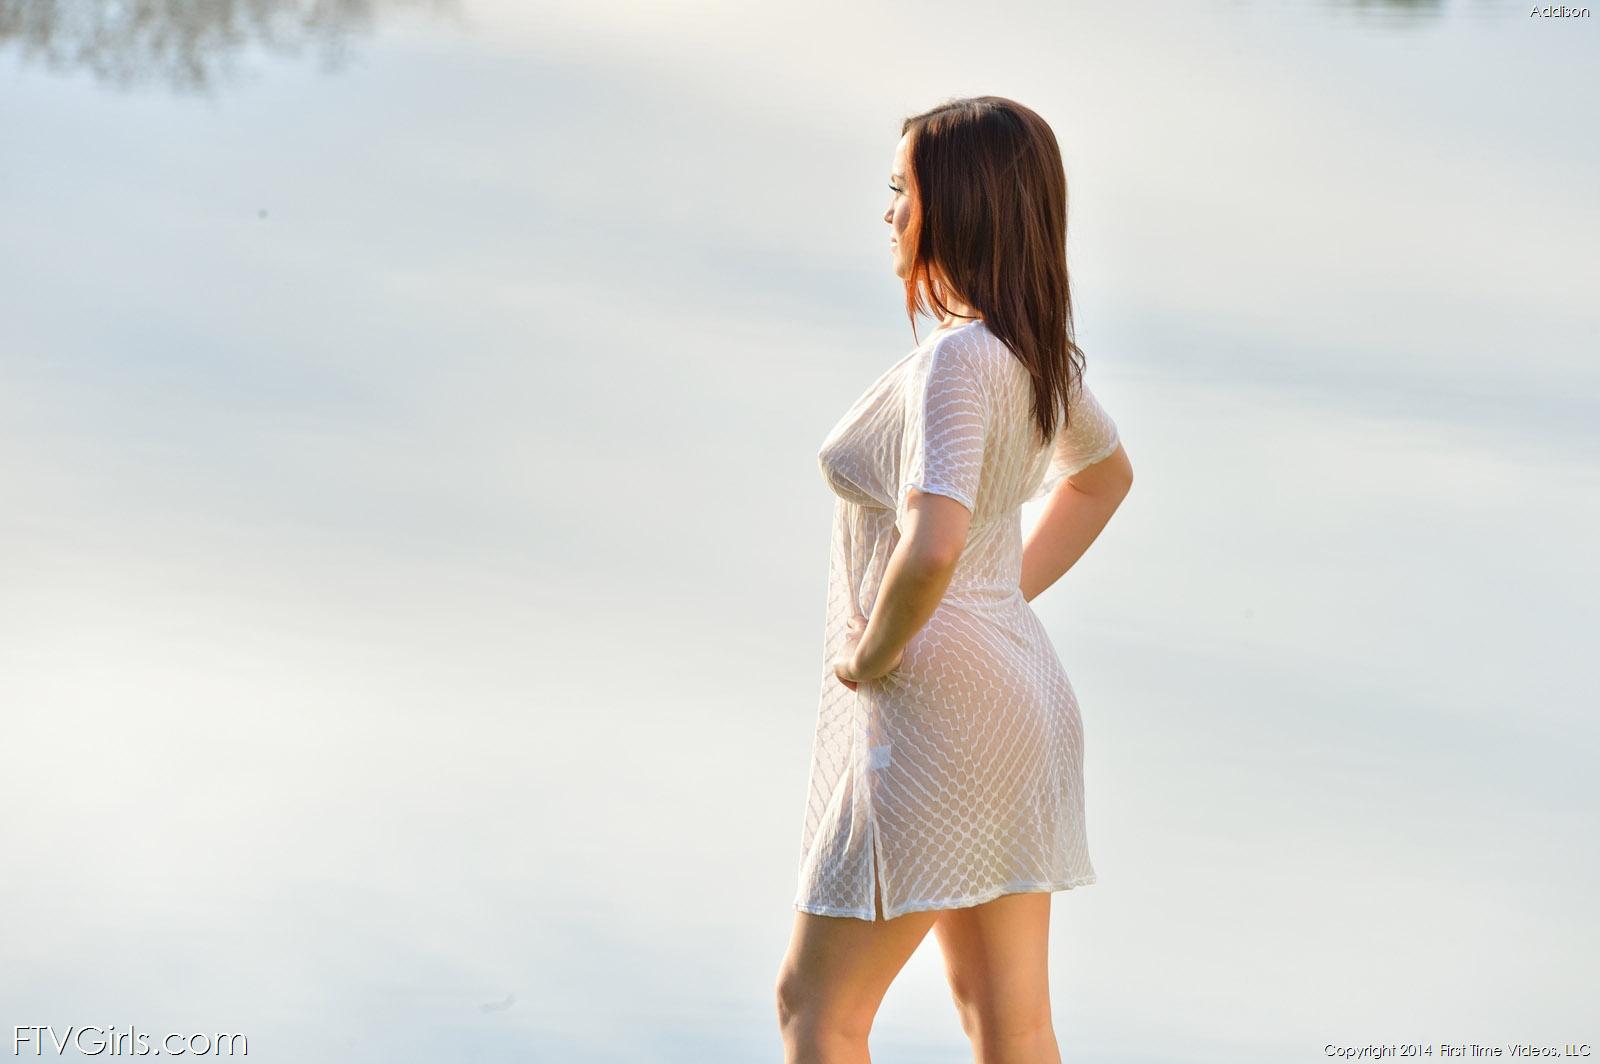 Public nudity ftv addison sheer